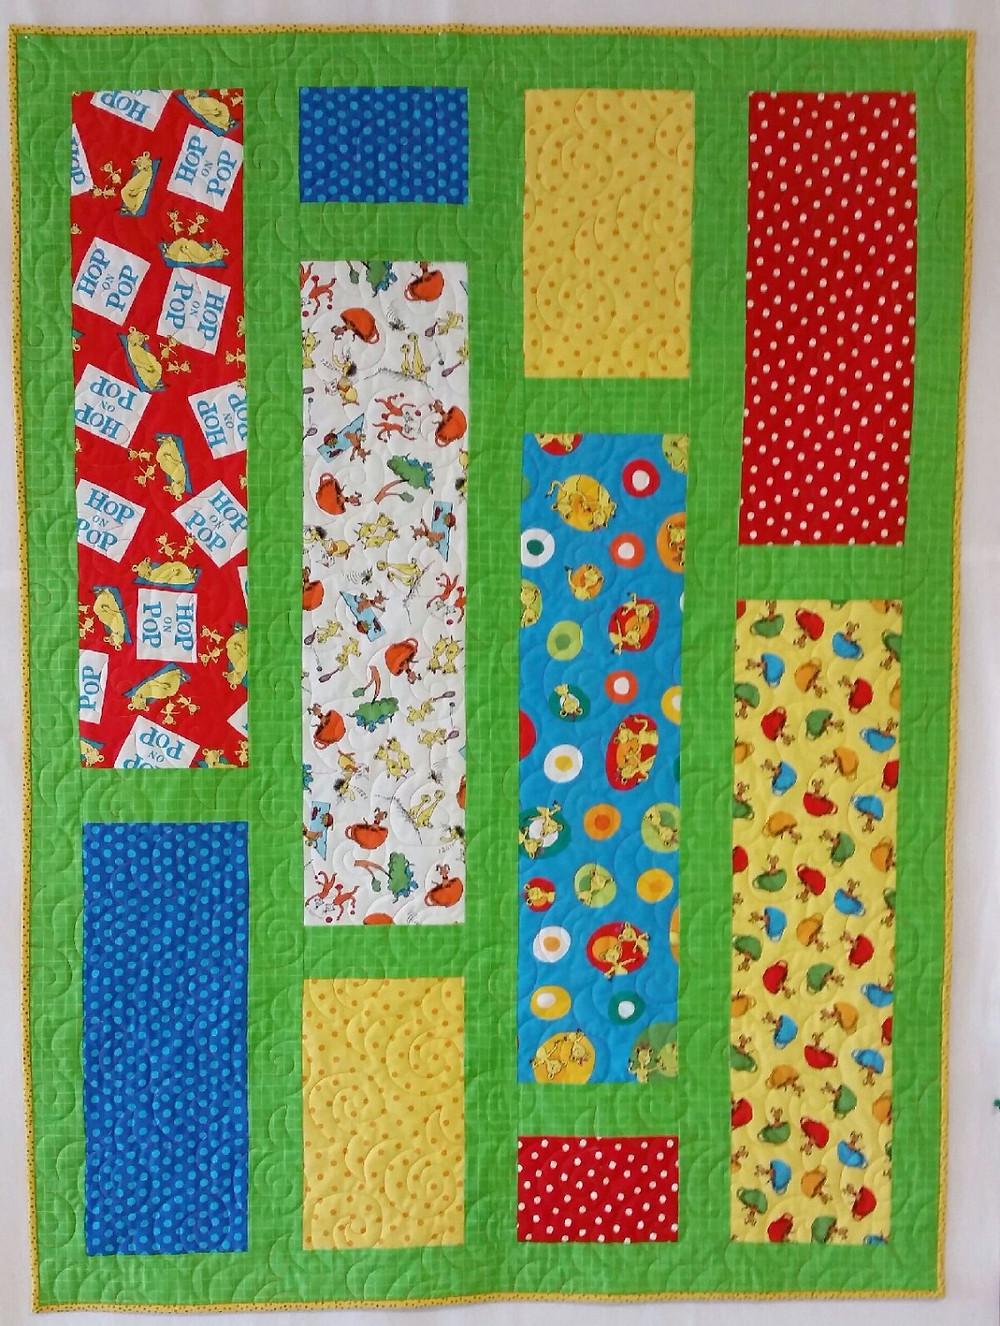 Finished Second Saturday Sampler quilt